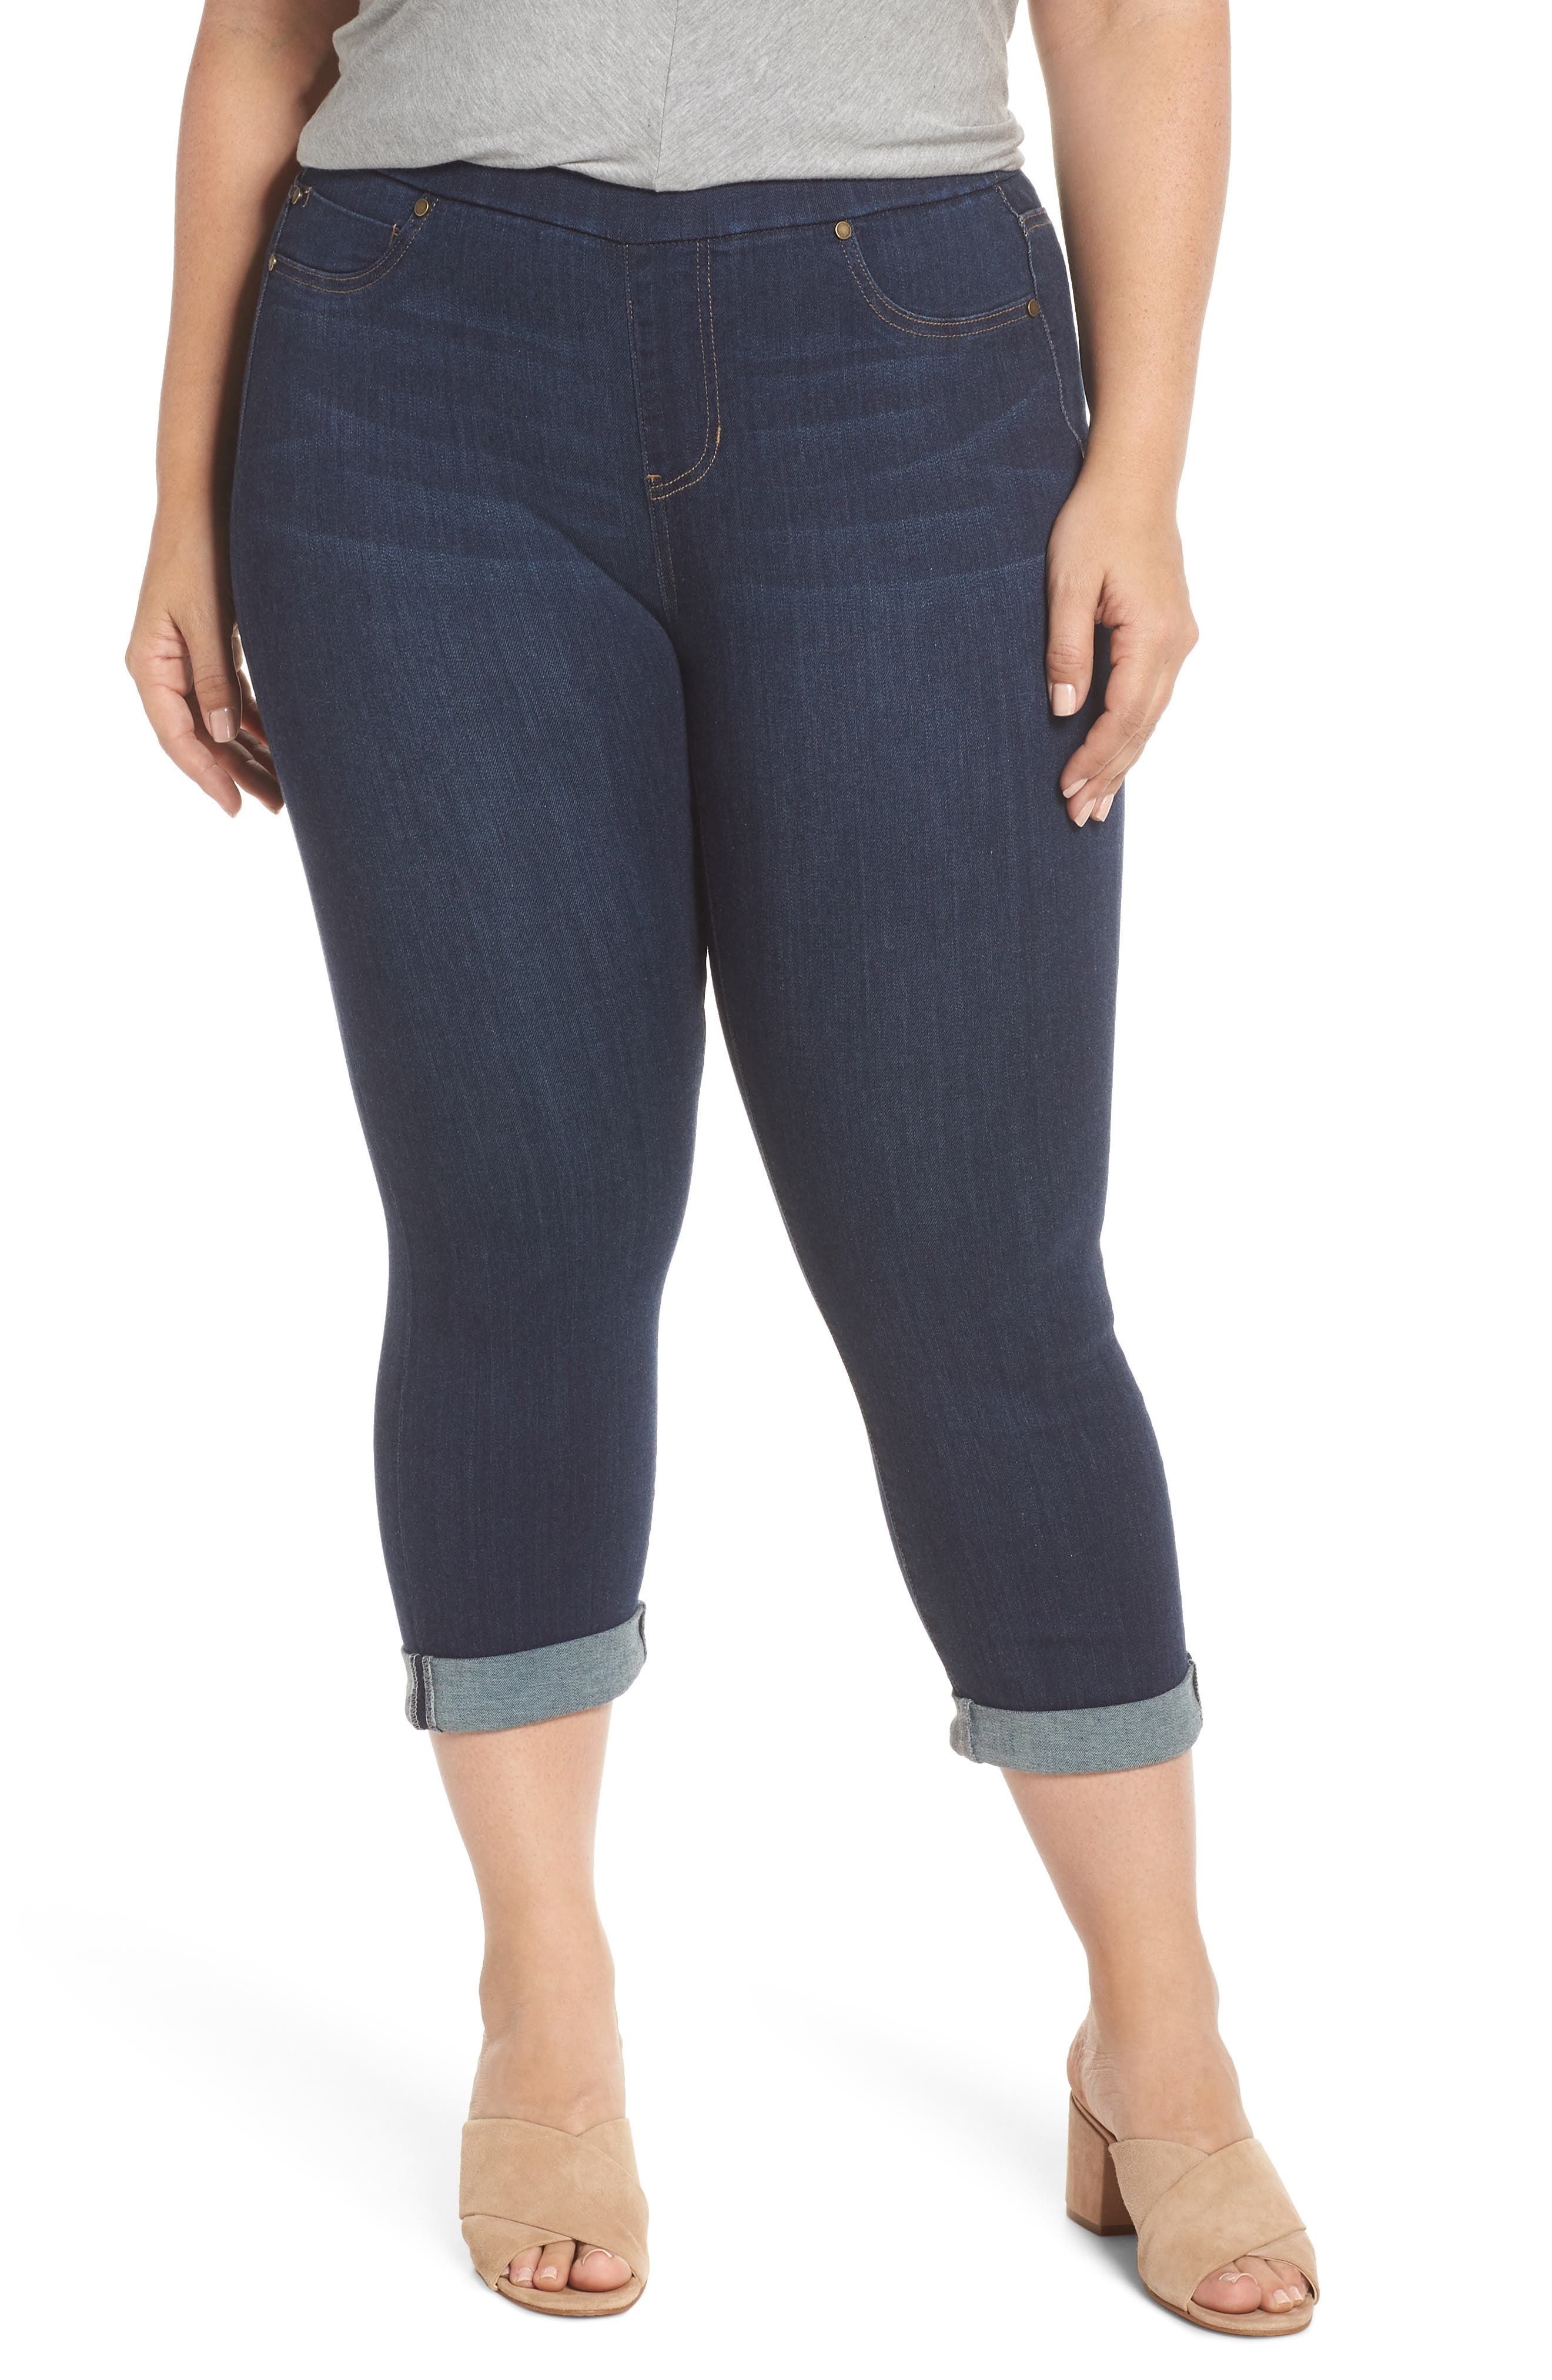 Sienna Pull-On Denim Capri Pants,                         Main,                         color, GRIFFITH SUPER DARK